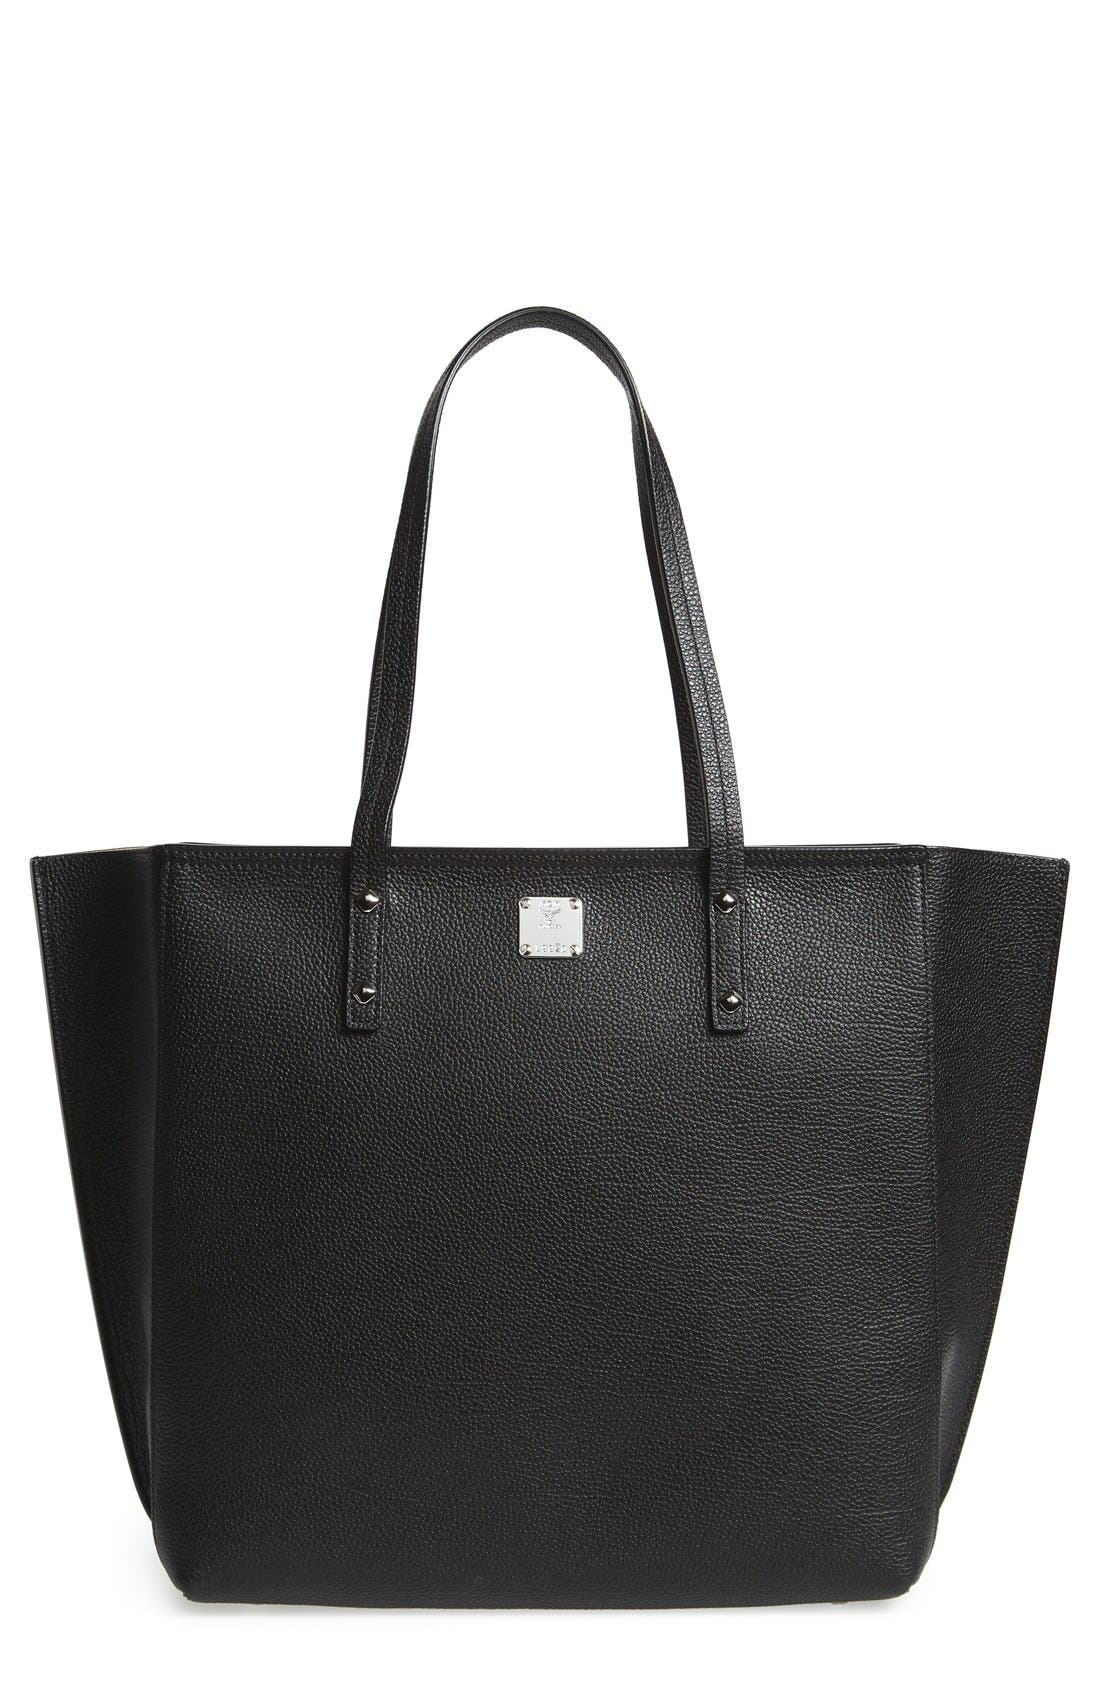 'Medium Sophie' Leather Shopper,                             Main thumbnail 1, color,                             Black